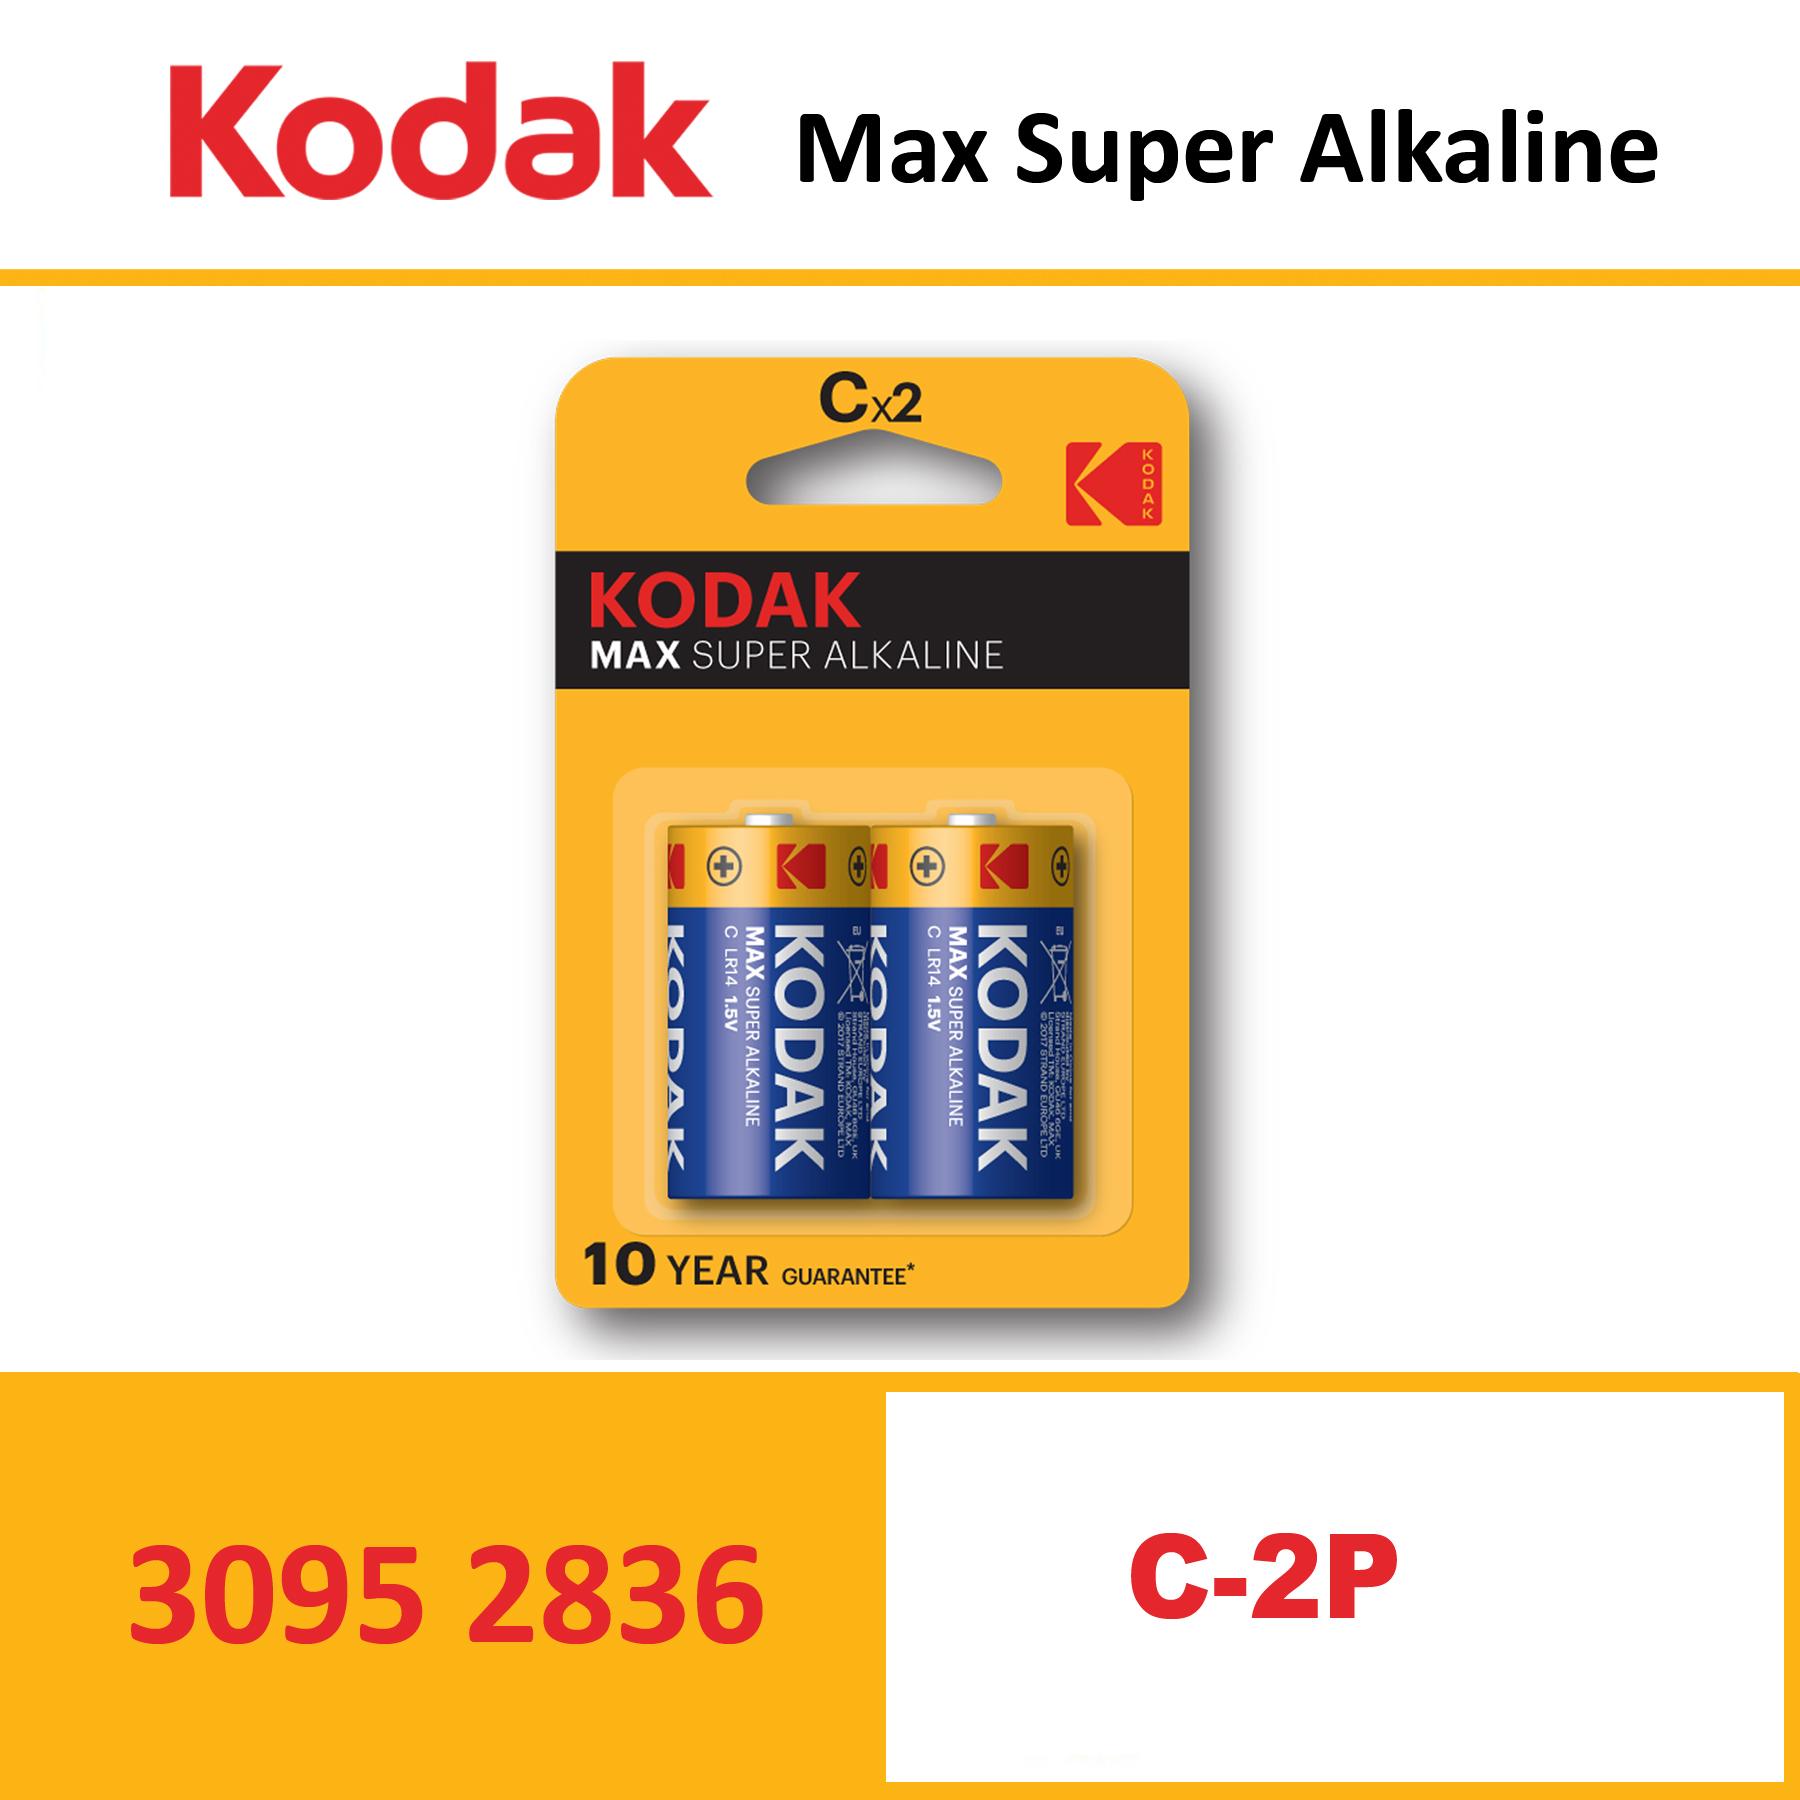 KODAK Max Alkaline batteries KC-2